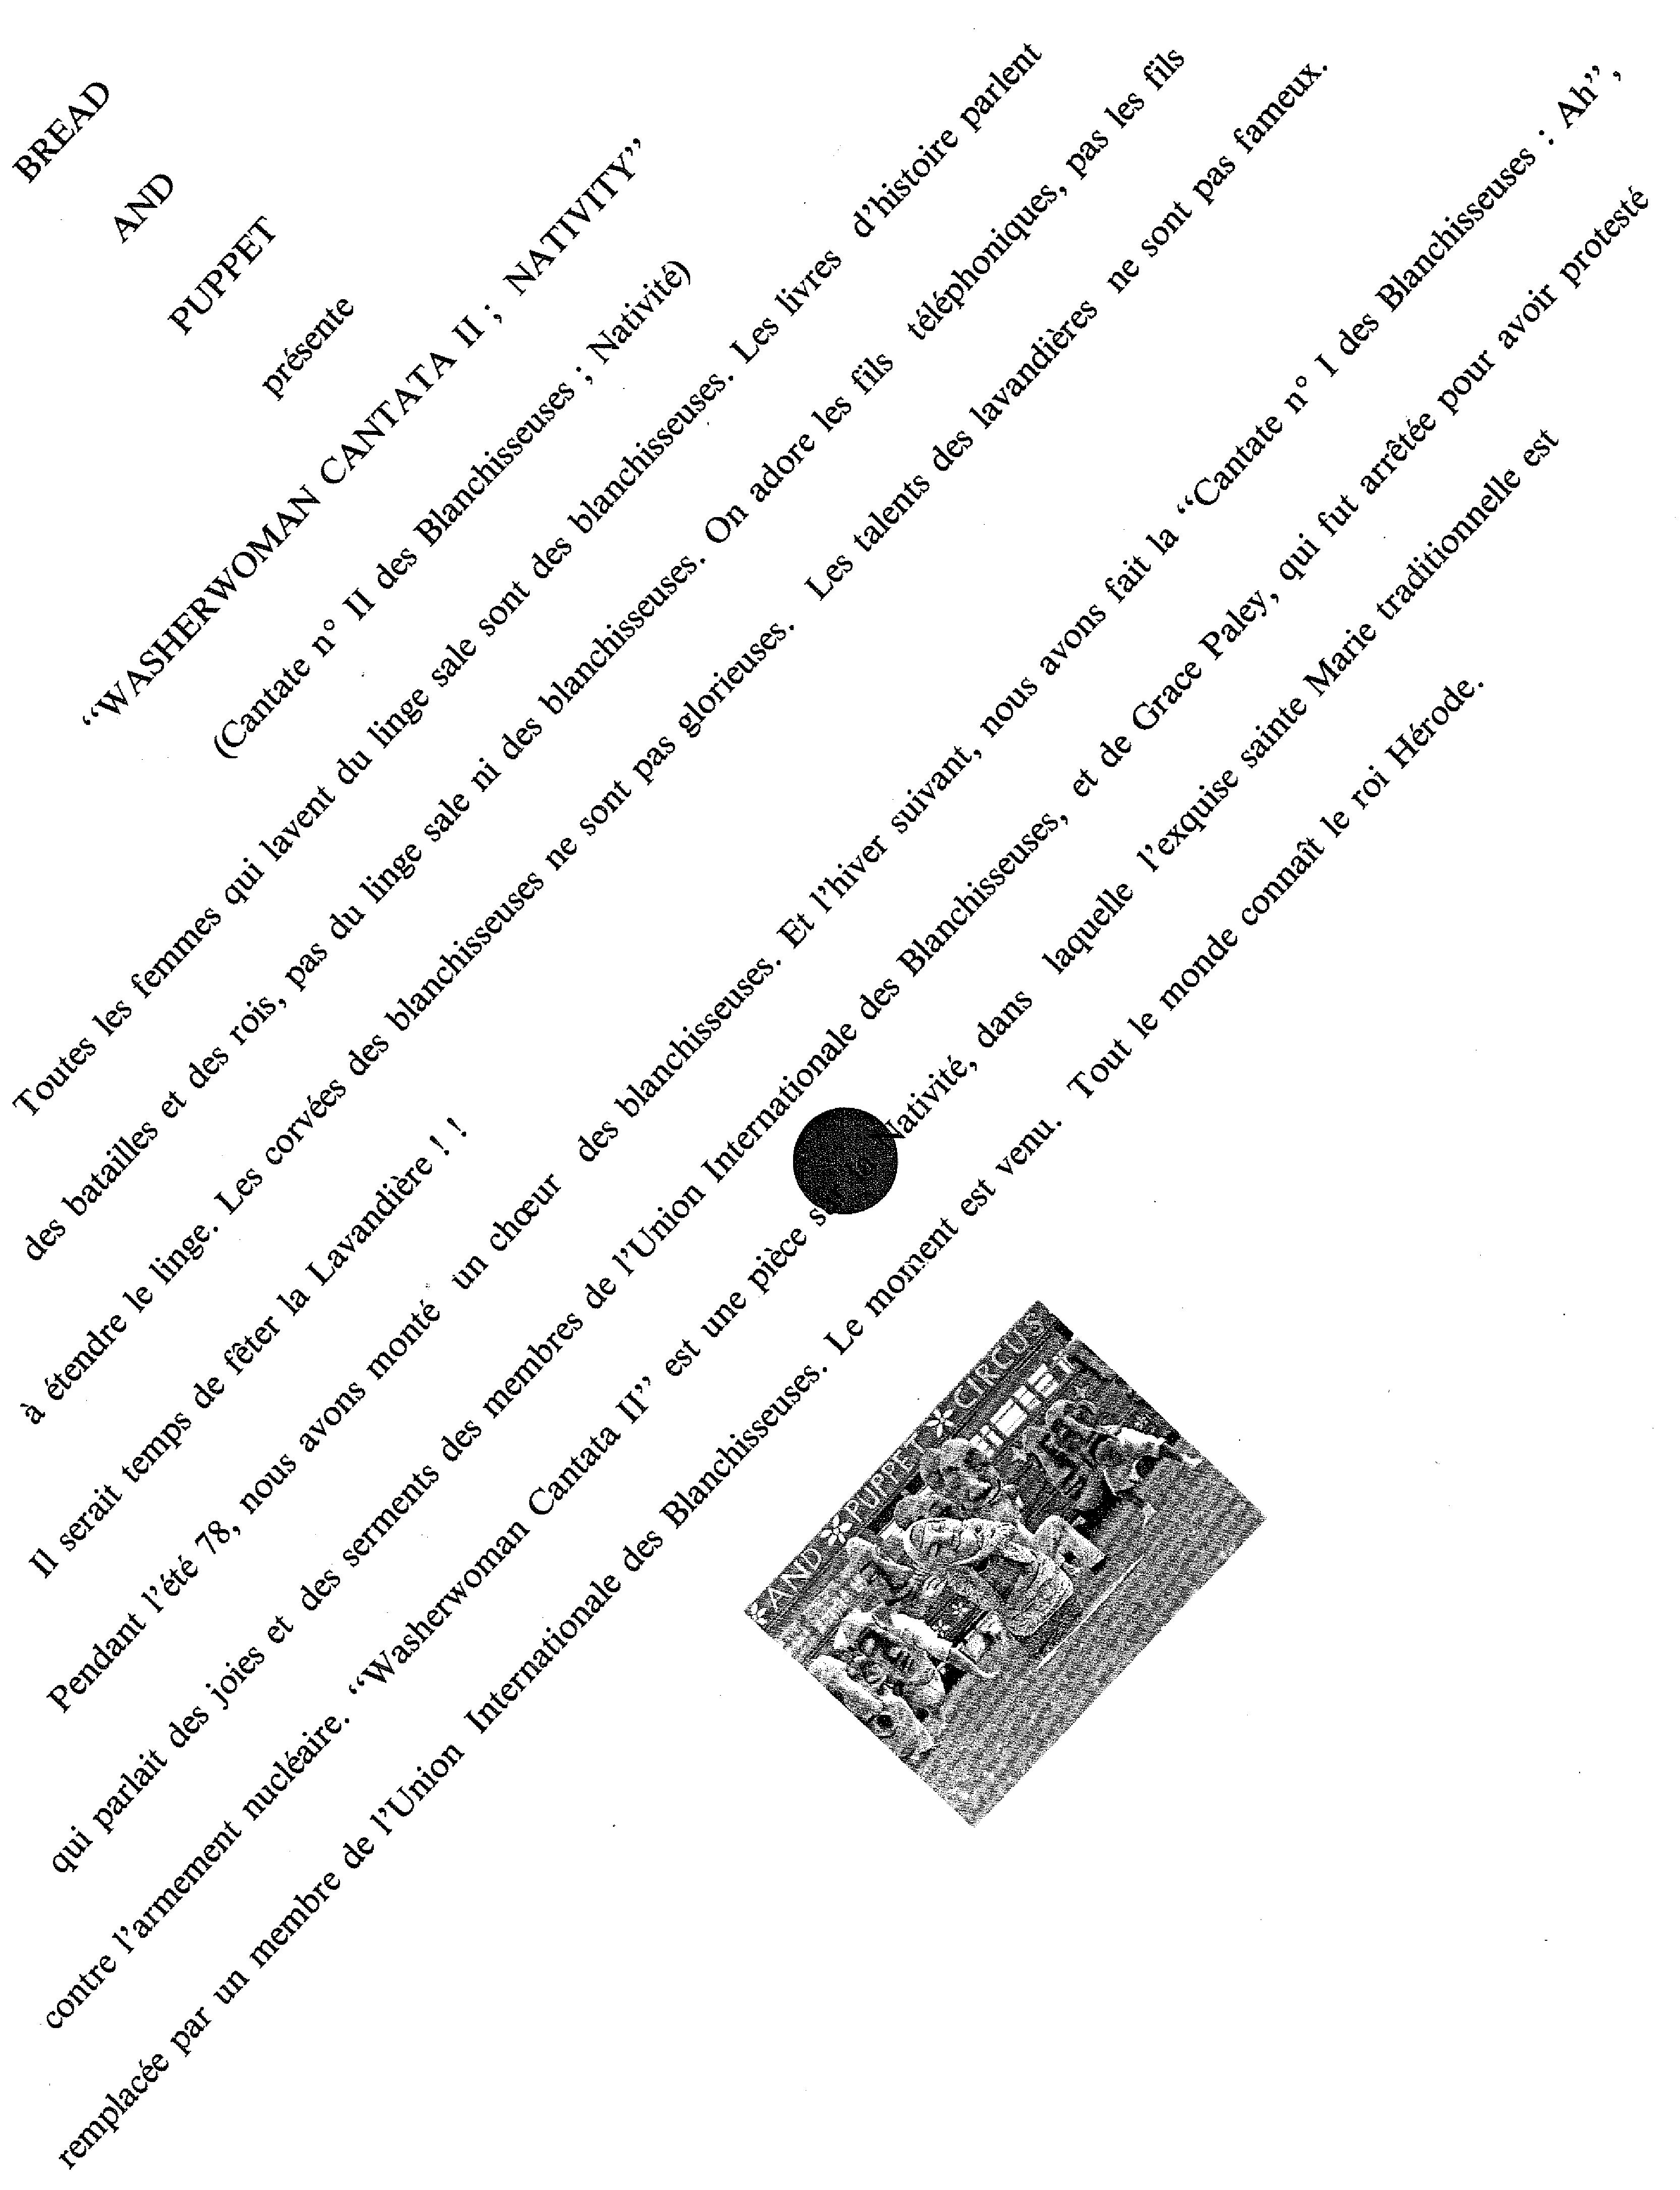 Figure 6. Bread and Puppet Theatre, Washerwoman Cantate II ; Nativity, 1979. Archives de Meurthe-et-Moselle, cote du document : 68J9.